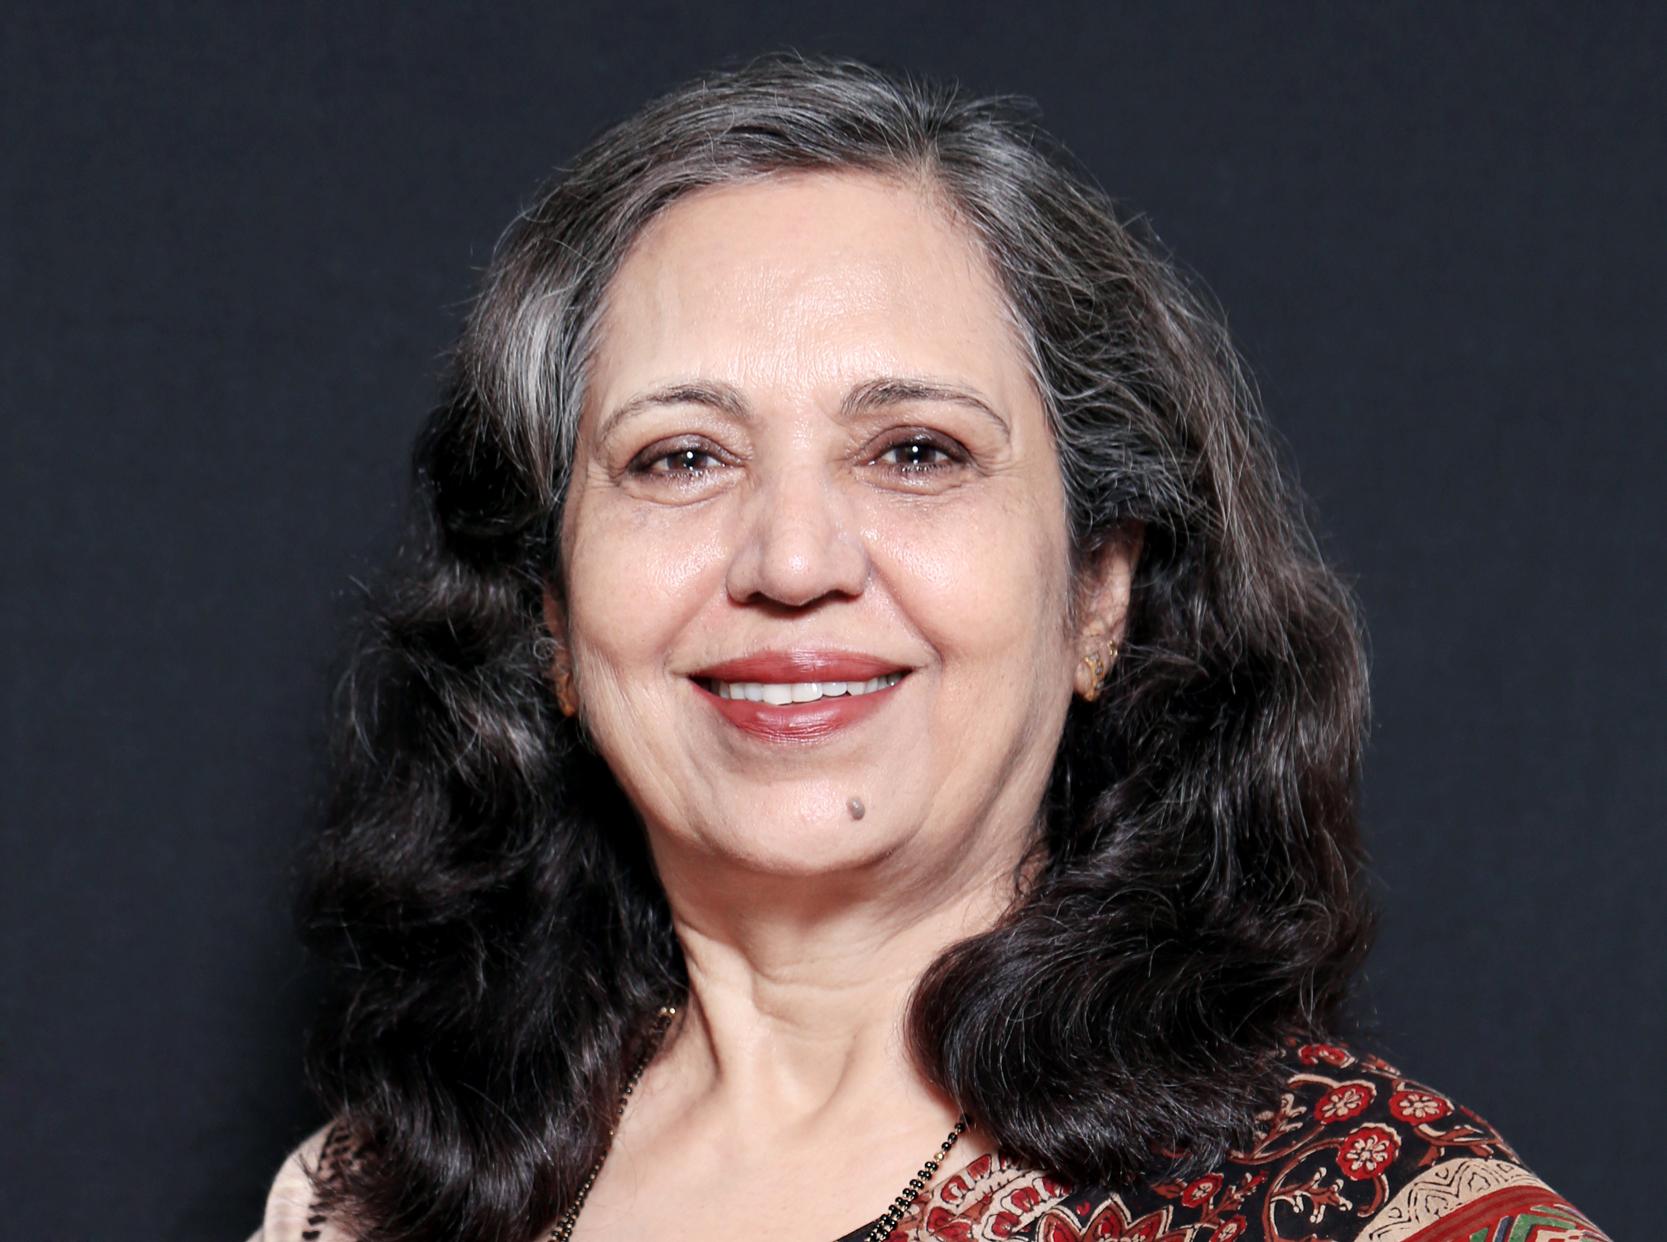 Manju Jaidka (Dean, Dept. of English) -- PhD (Dept of English, PU), Postdoc Fulbright fellow (Harvard), Yale Rockefeller fellow (Bellagio, Italy) and University of Iowa, US